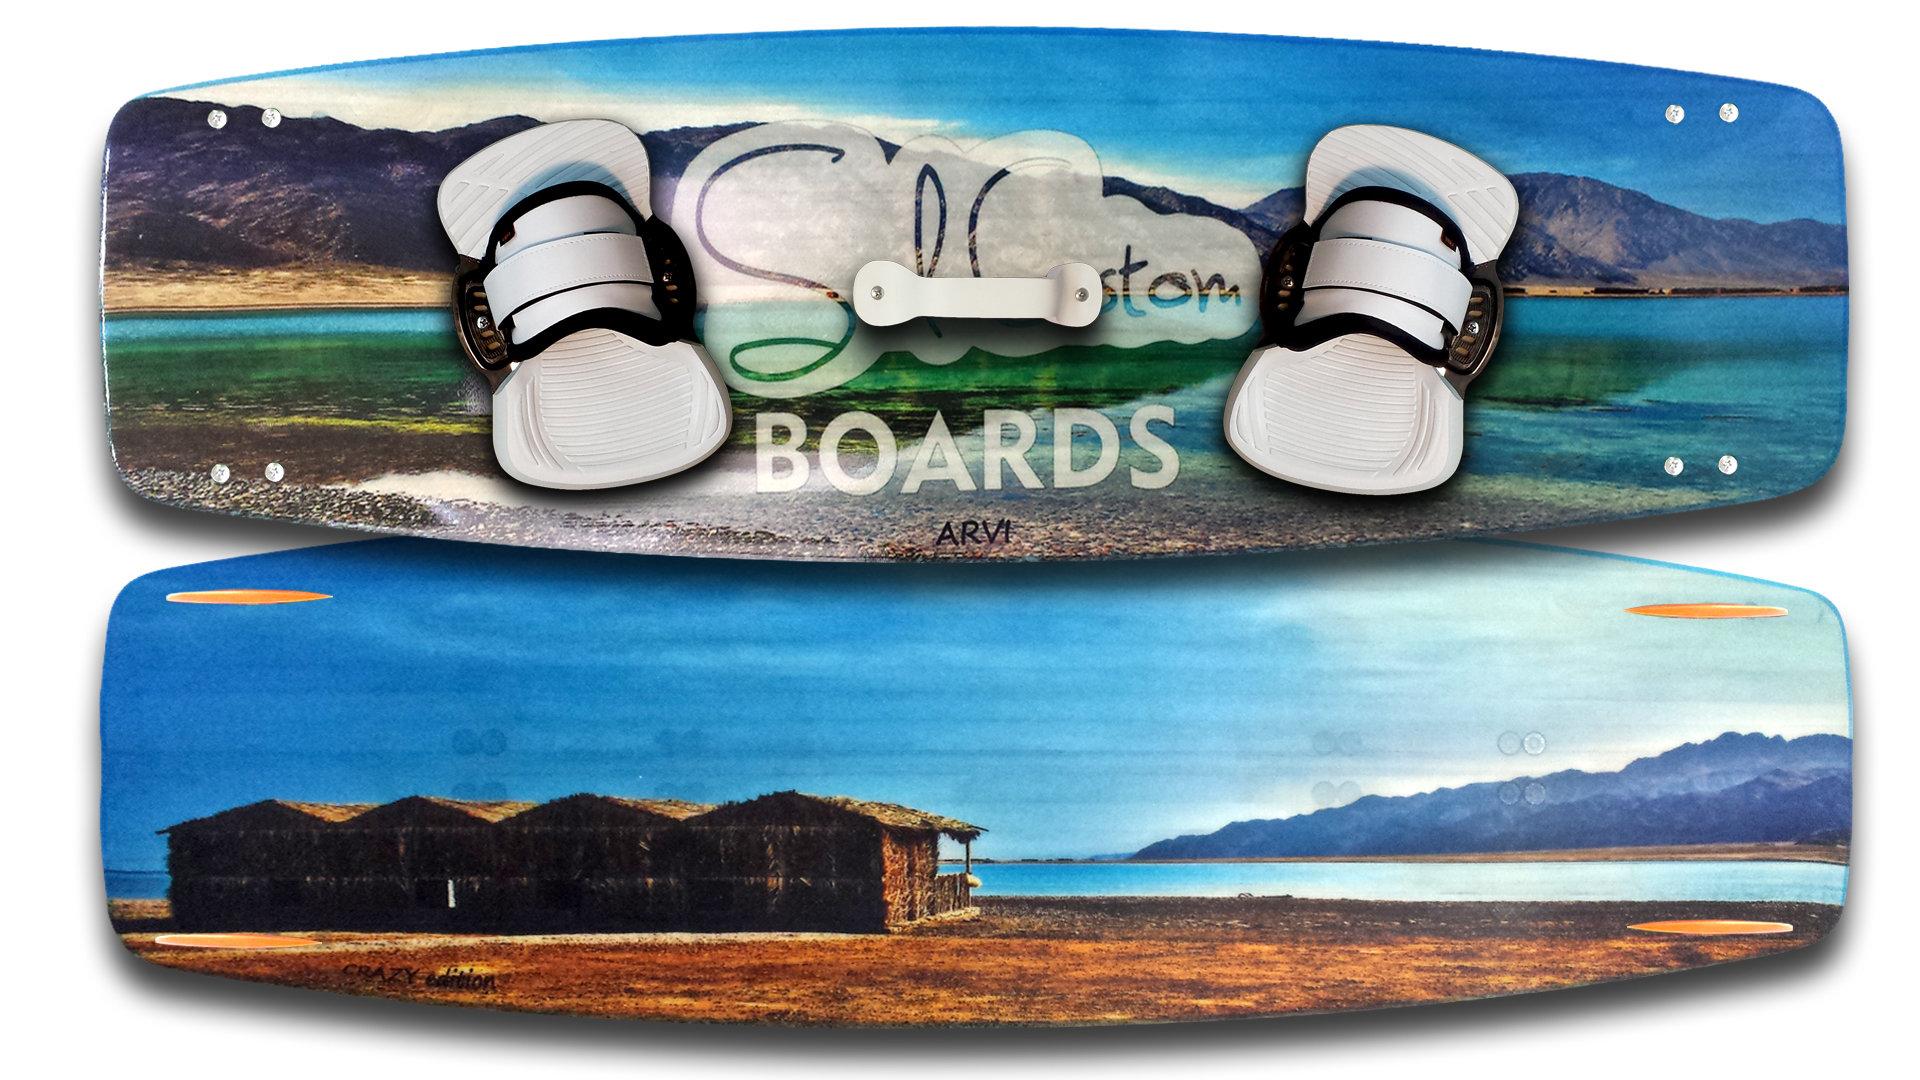 JustGo kiteboard - vivid custom graphics - Biaxial fiberglass construction 00002